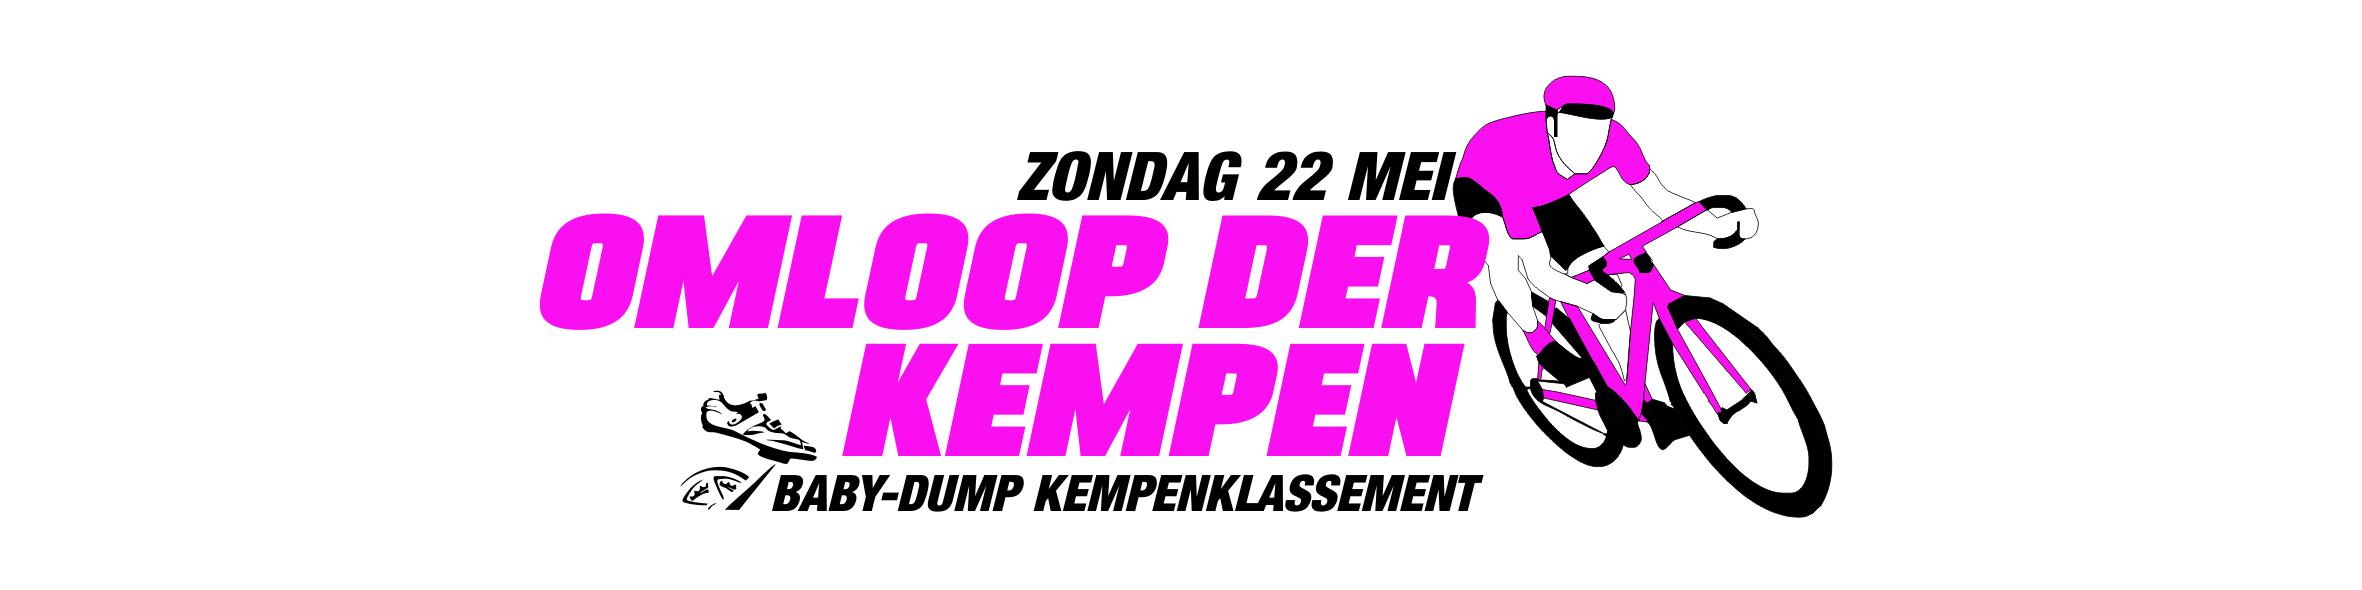 2016_W_Omloop der Kempen